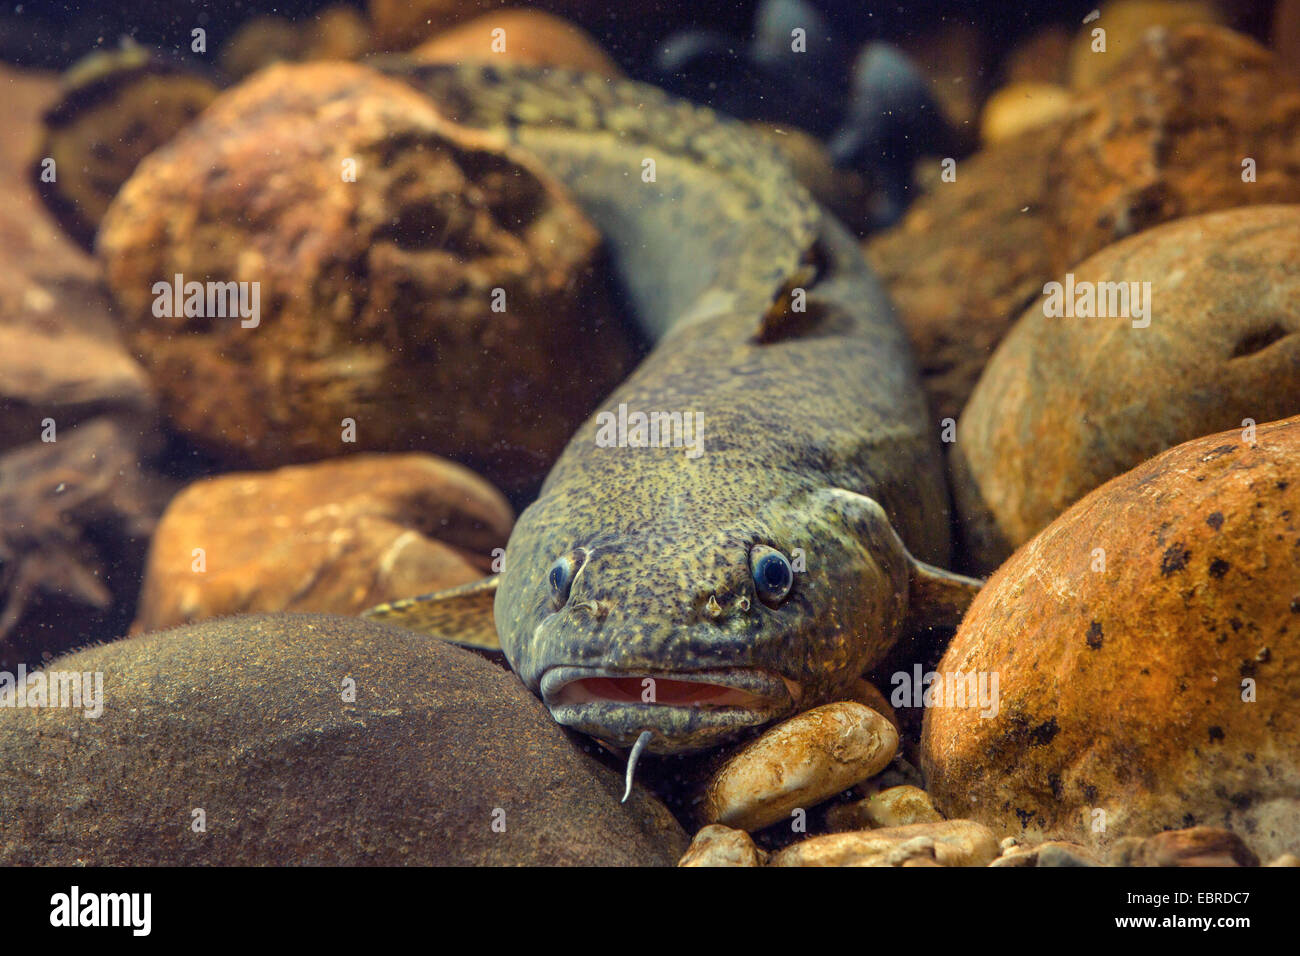 burbot (Lota lota), on pebbles, Germany - Stock Image